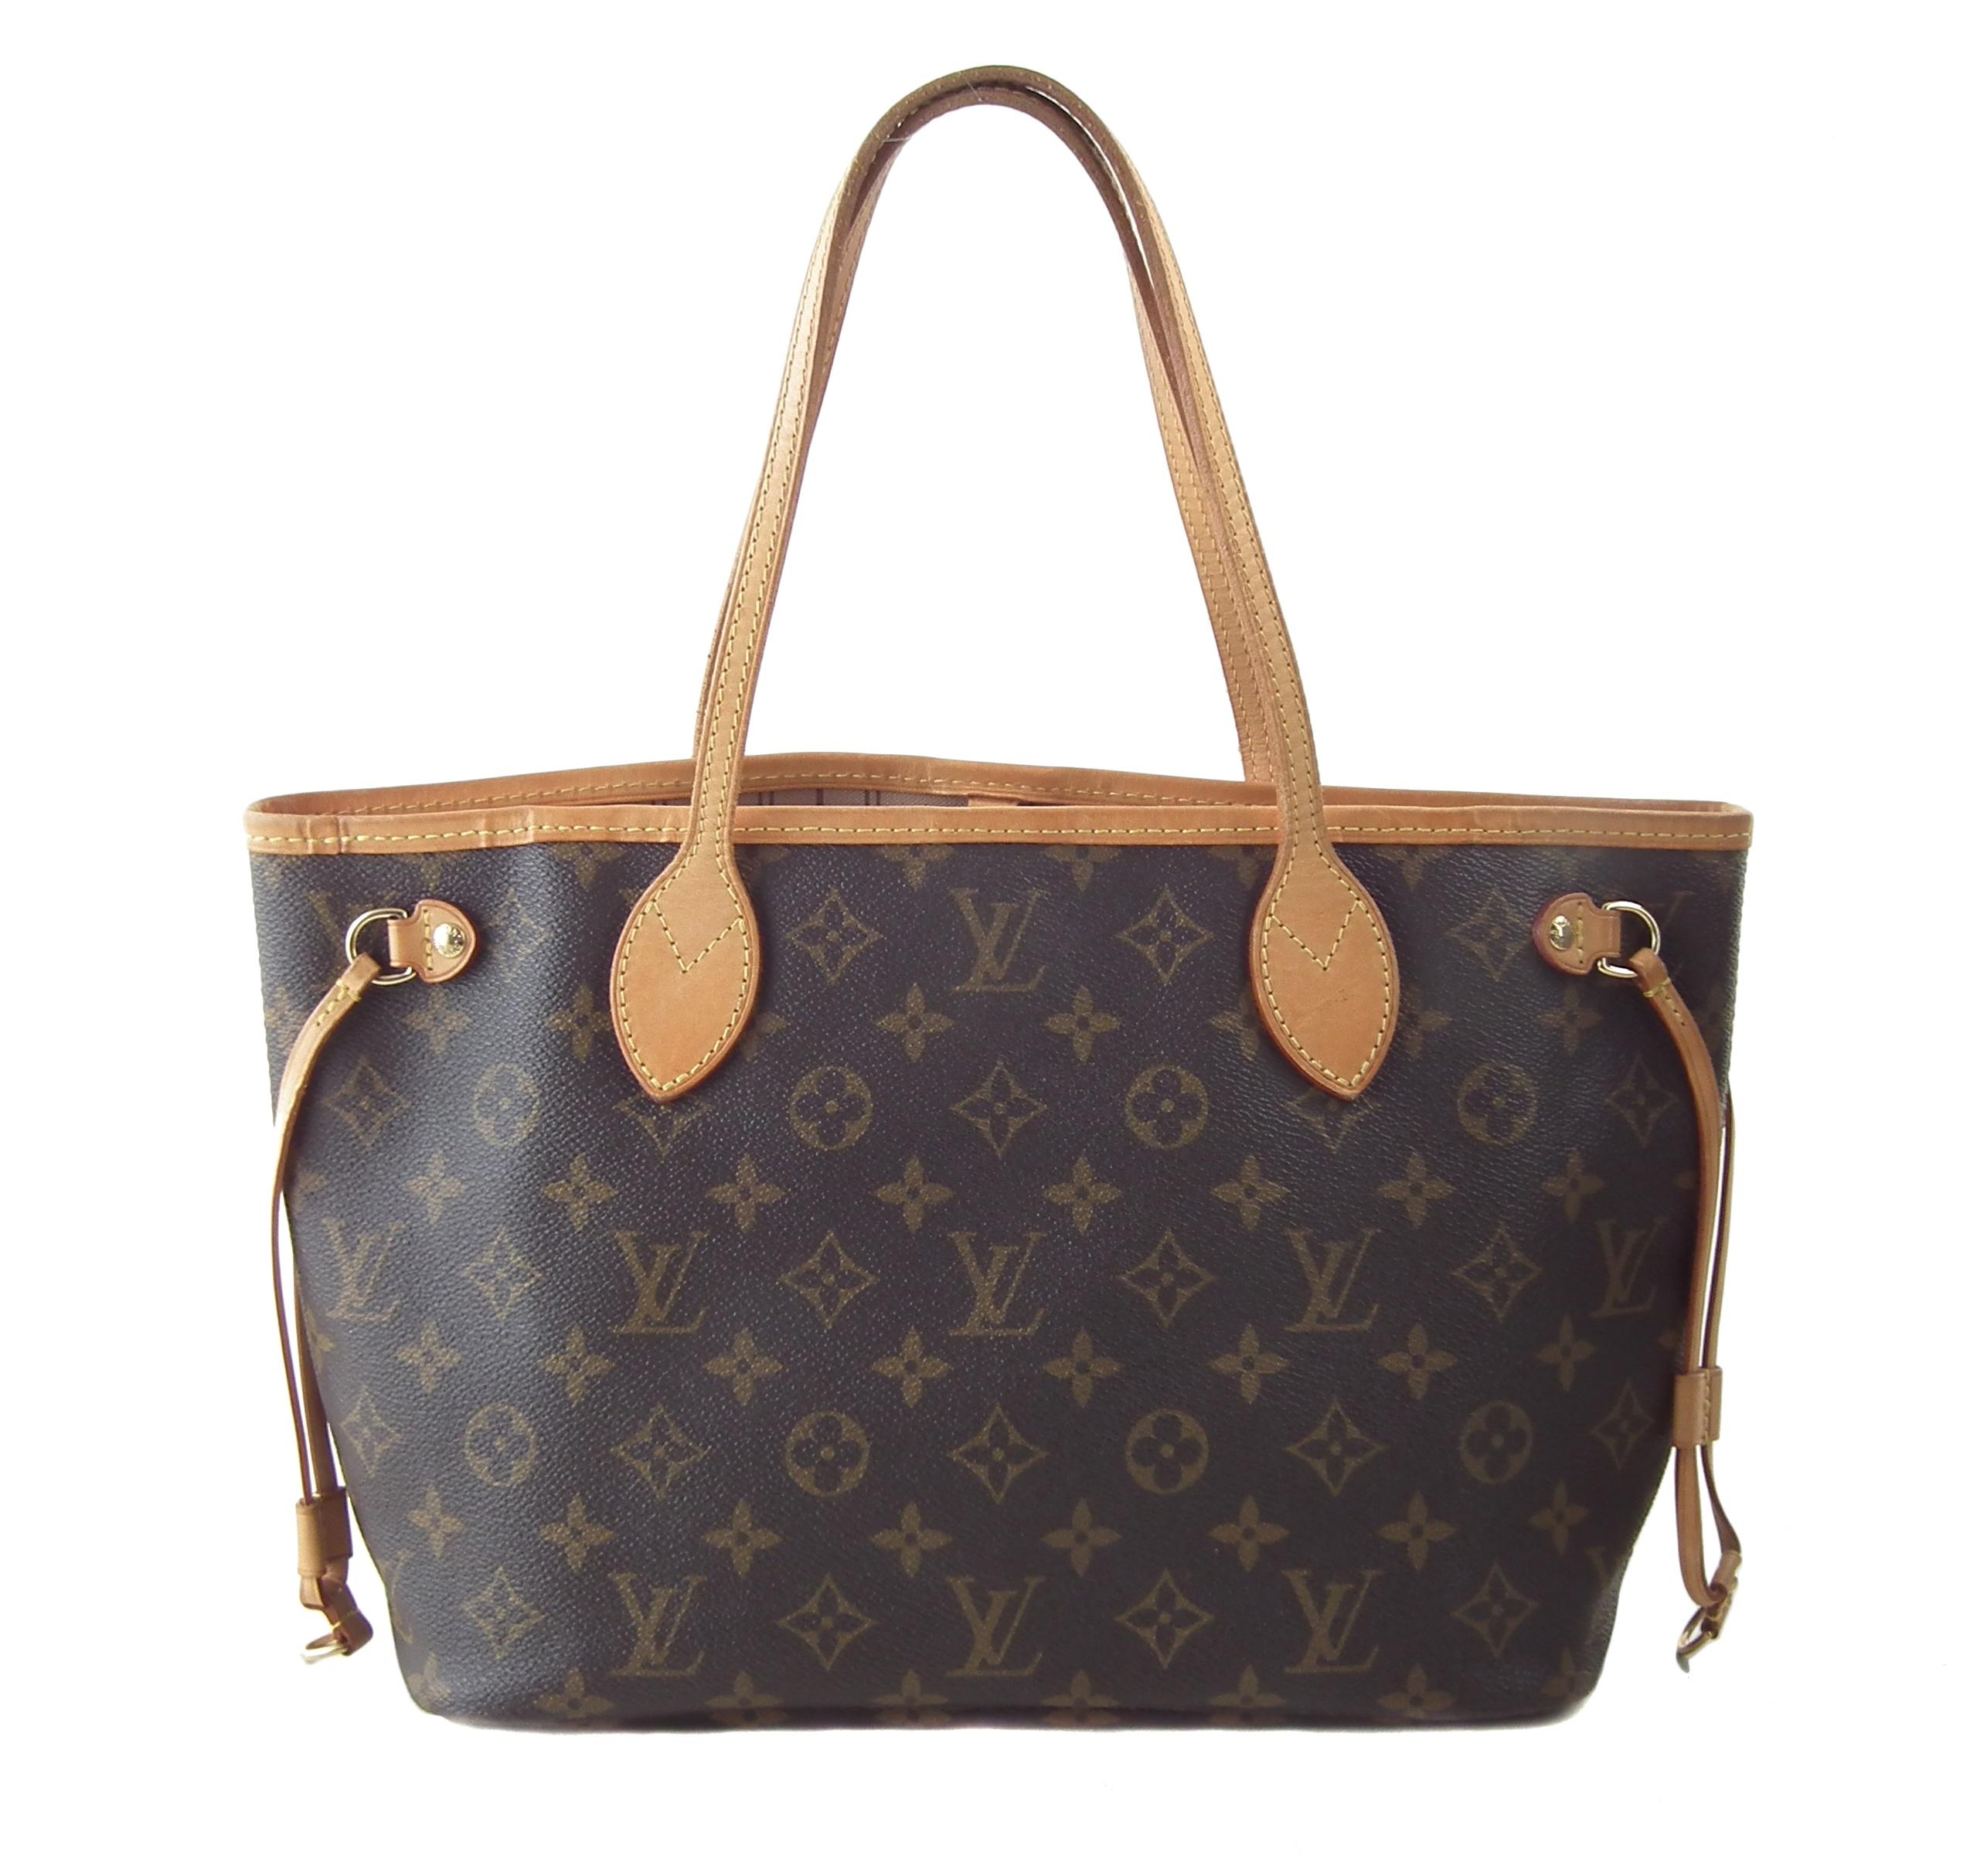 A Louis Vuitton Monogram Neverfull PM handbag